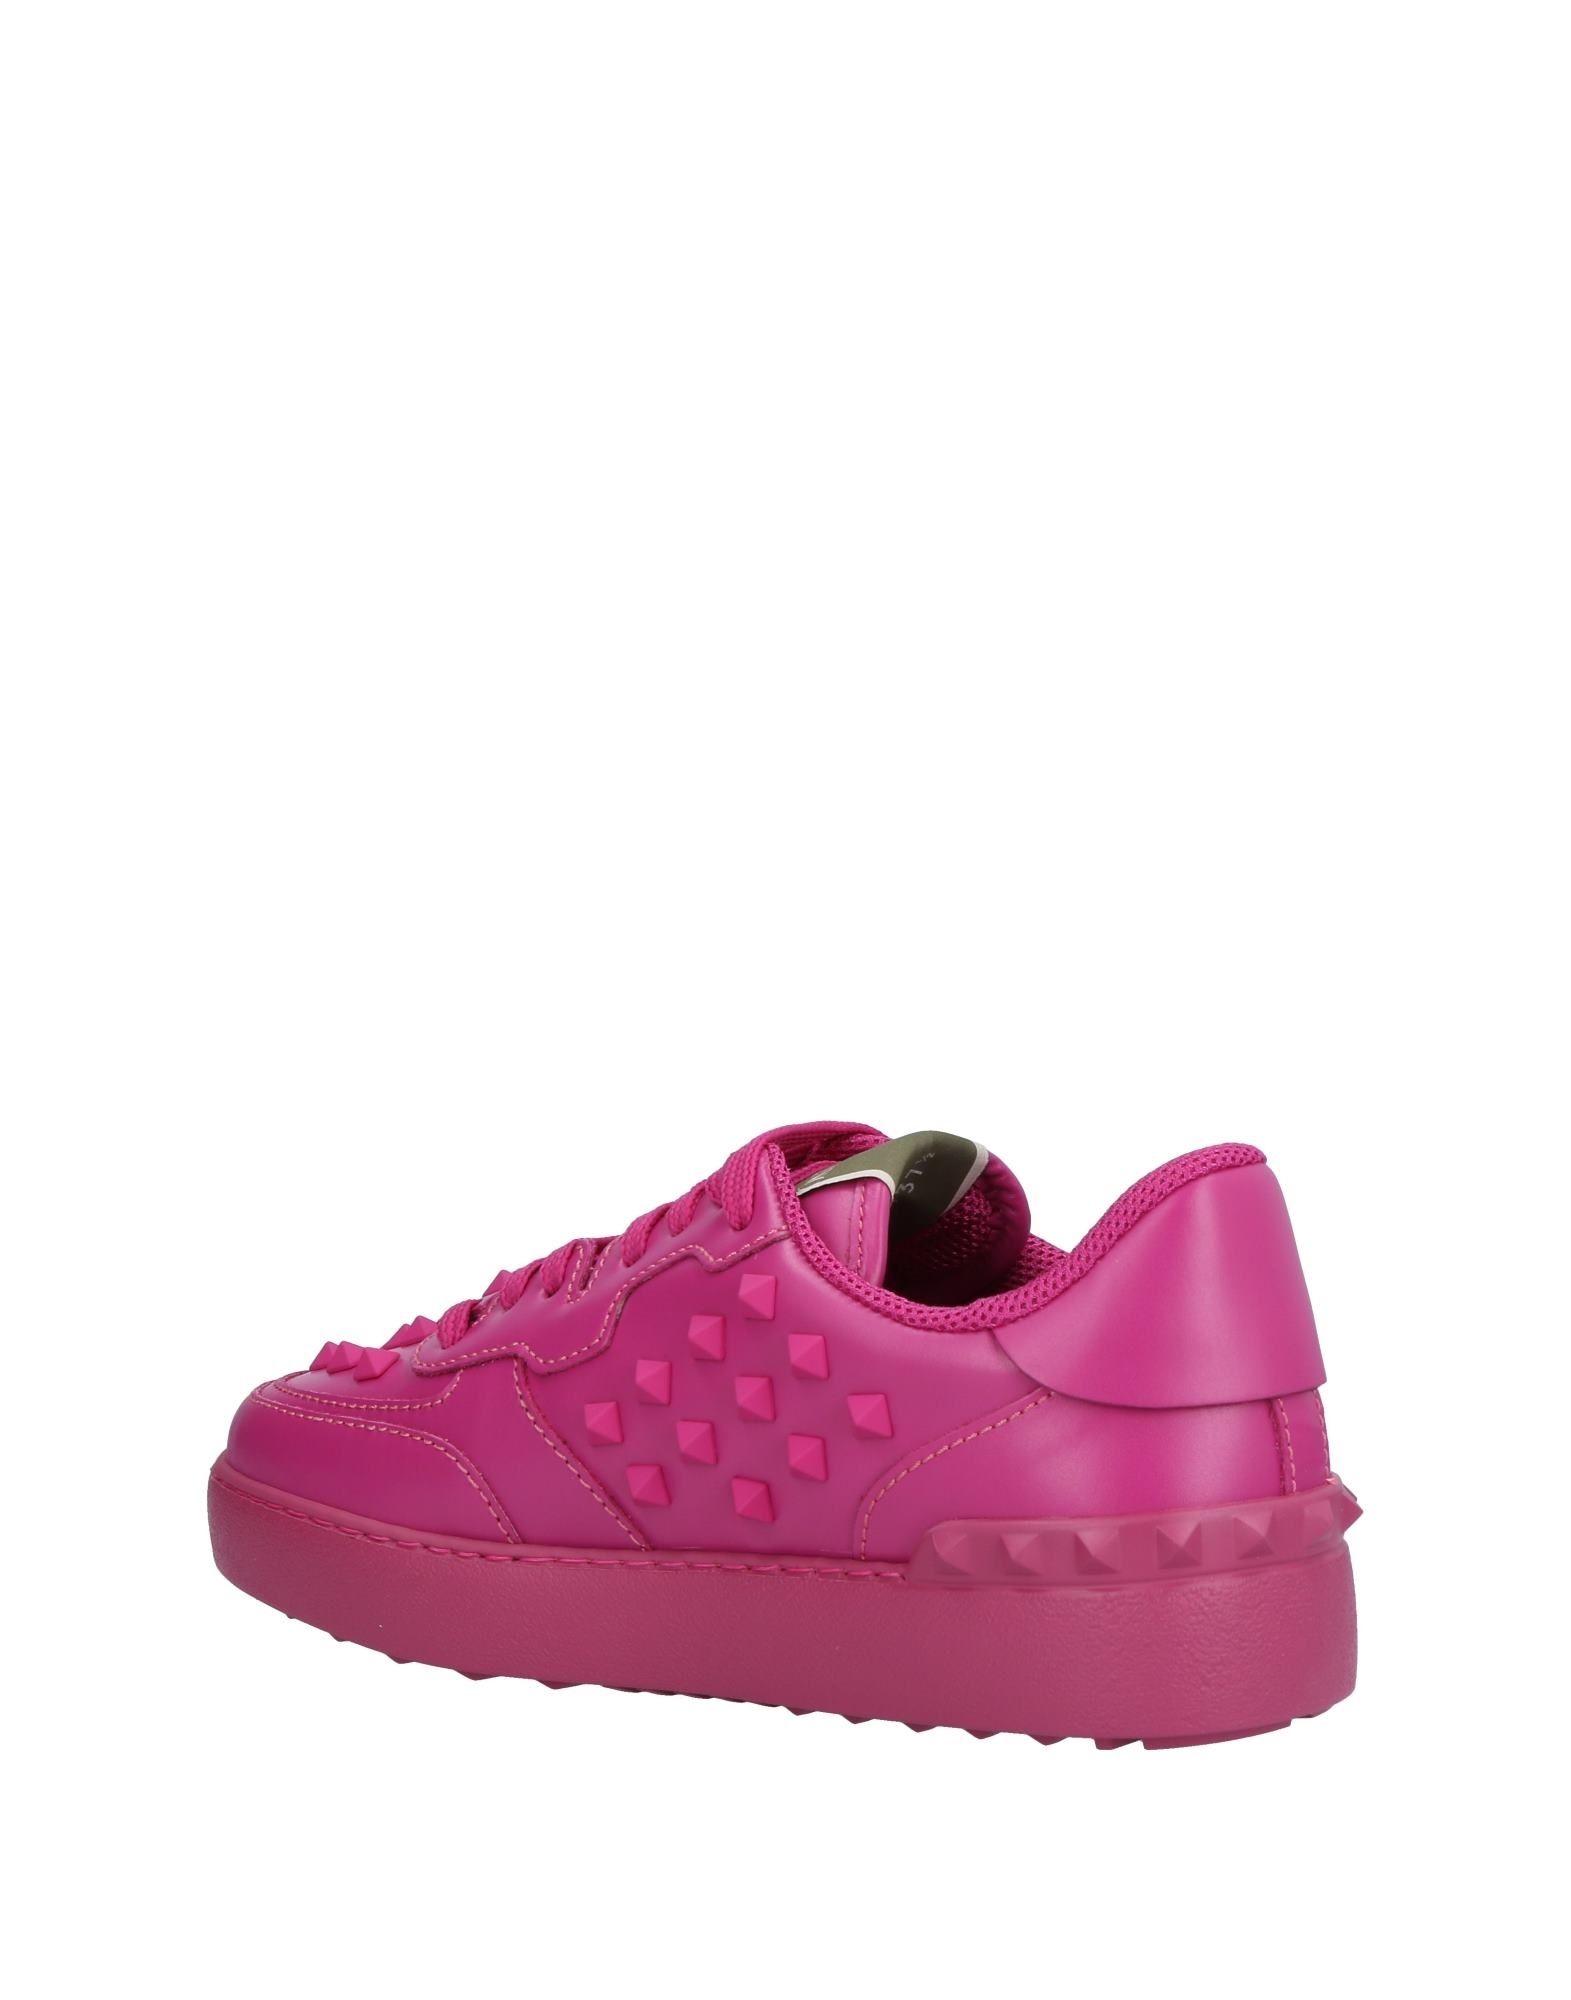 Sneakers Valentino Garavani Femme - Sneakers Valentino Garavani sur